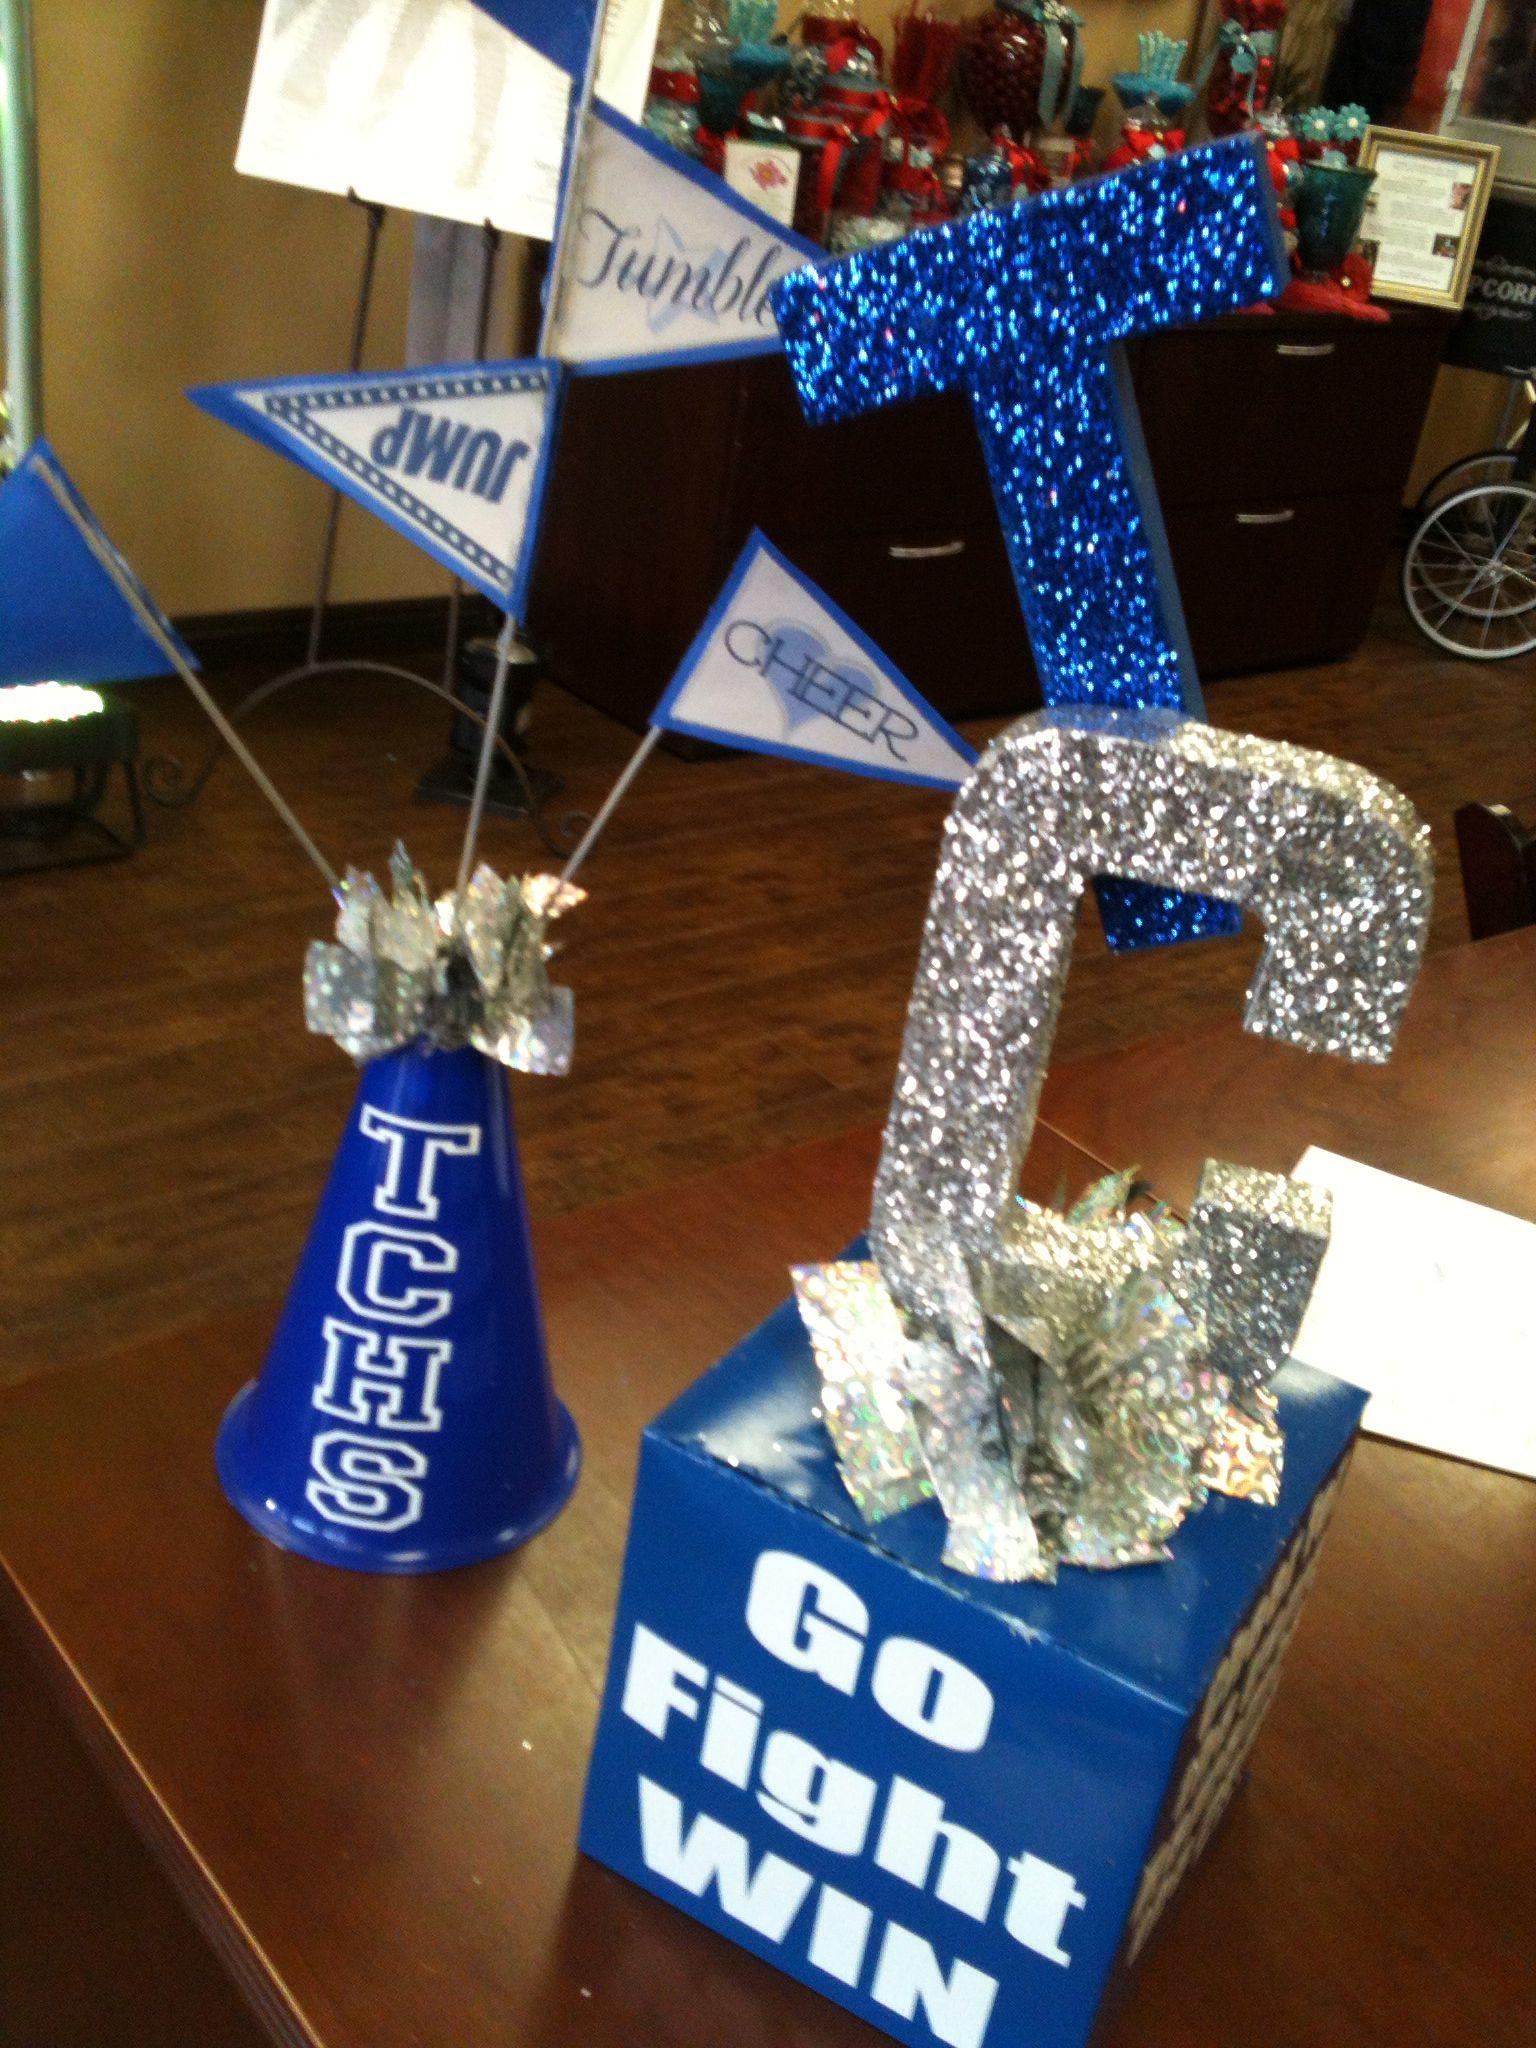 Cheerleading banquet centerpieces cheer pinterest for Cheerleading decorations